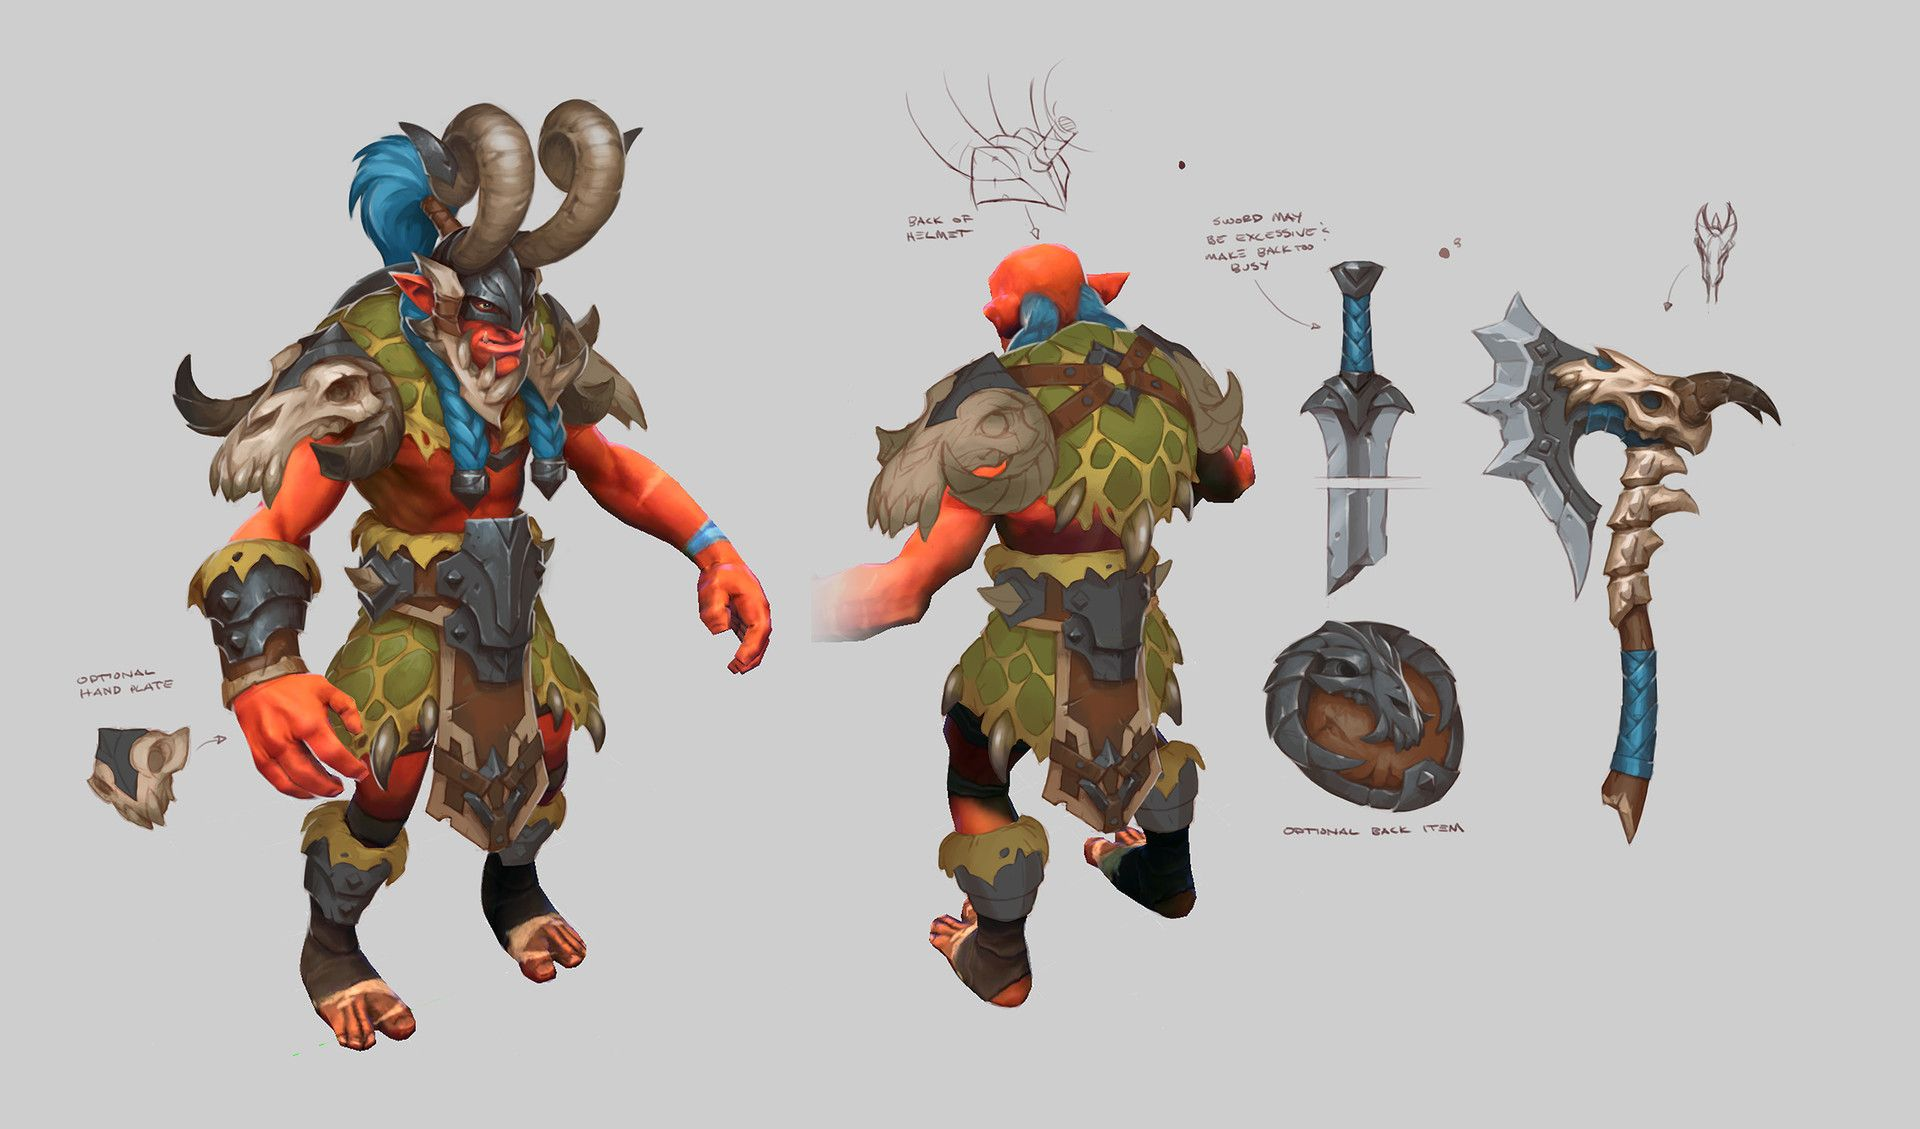 artstation wyvern bone battle armor troll warlord set kyle